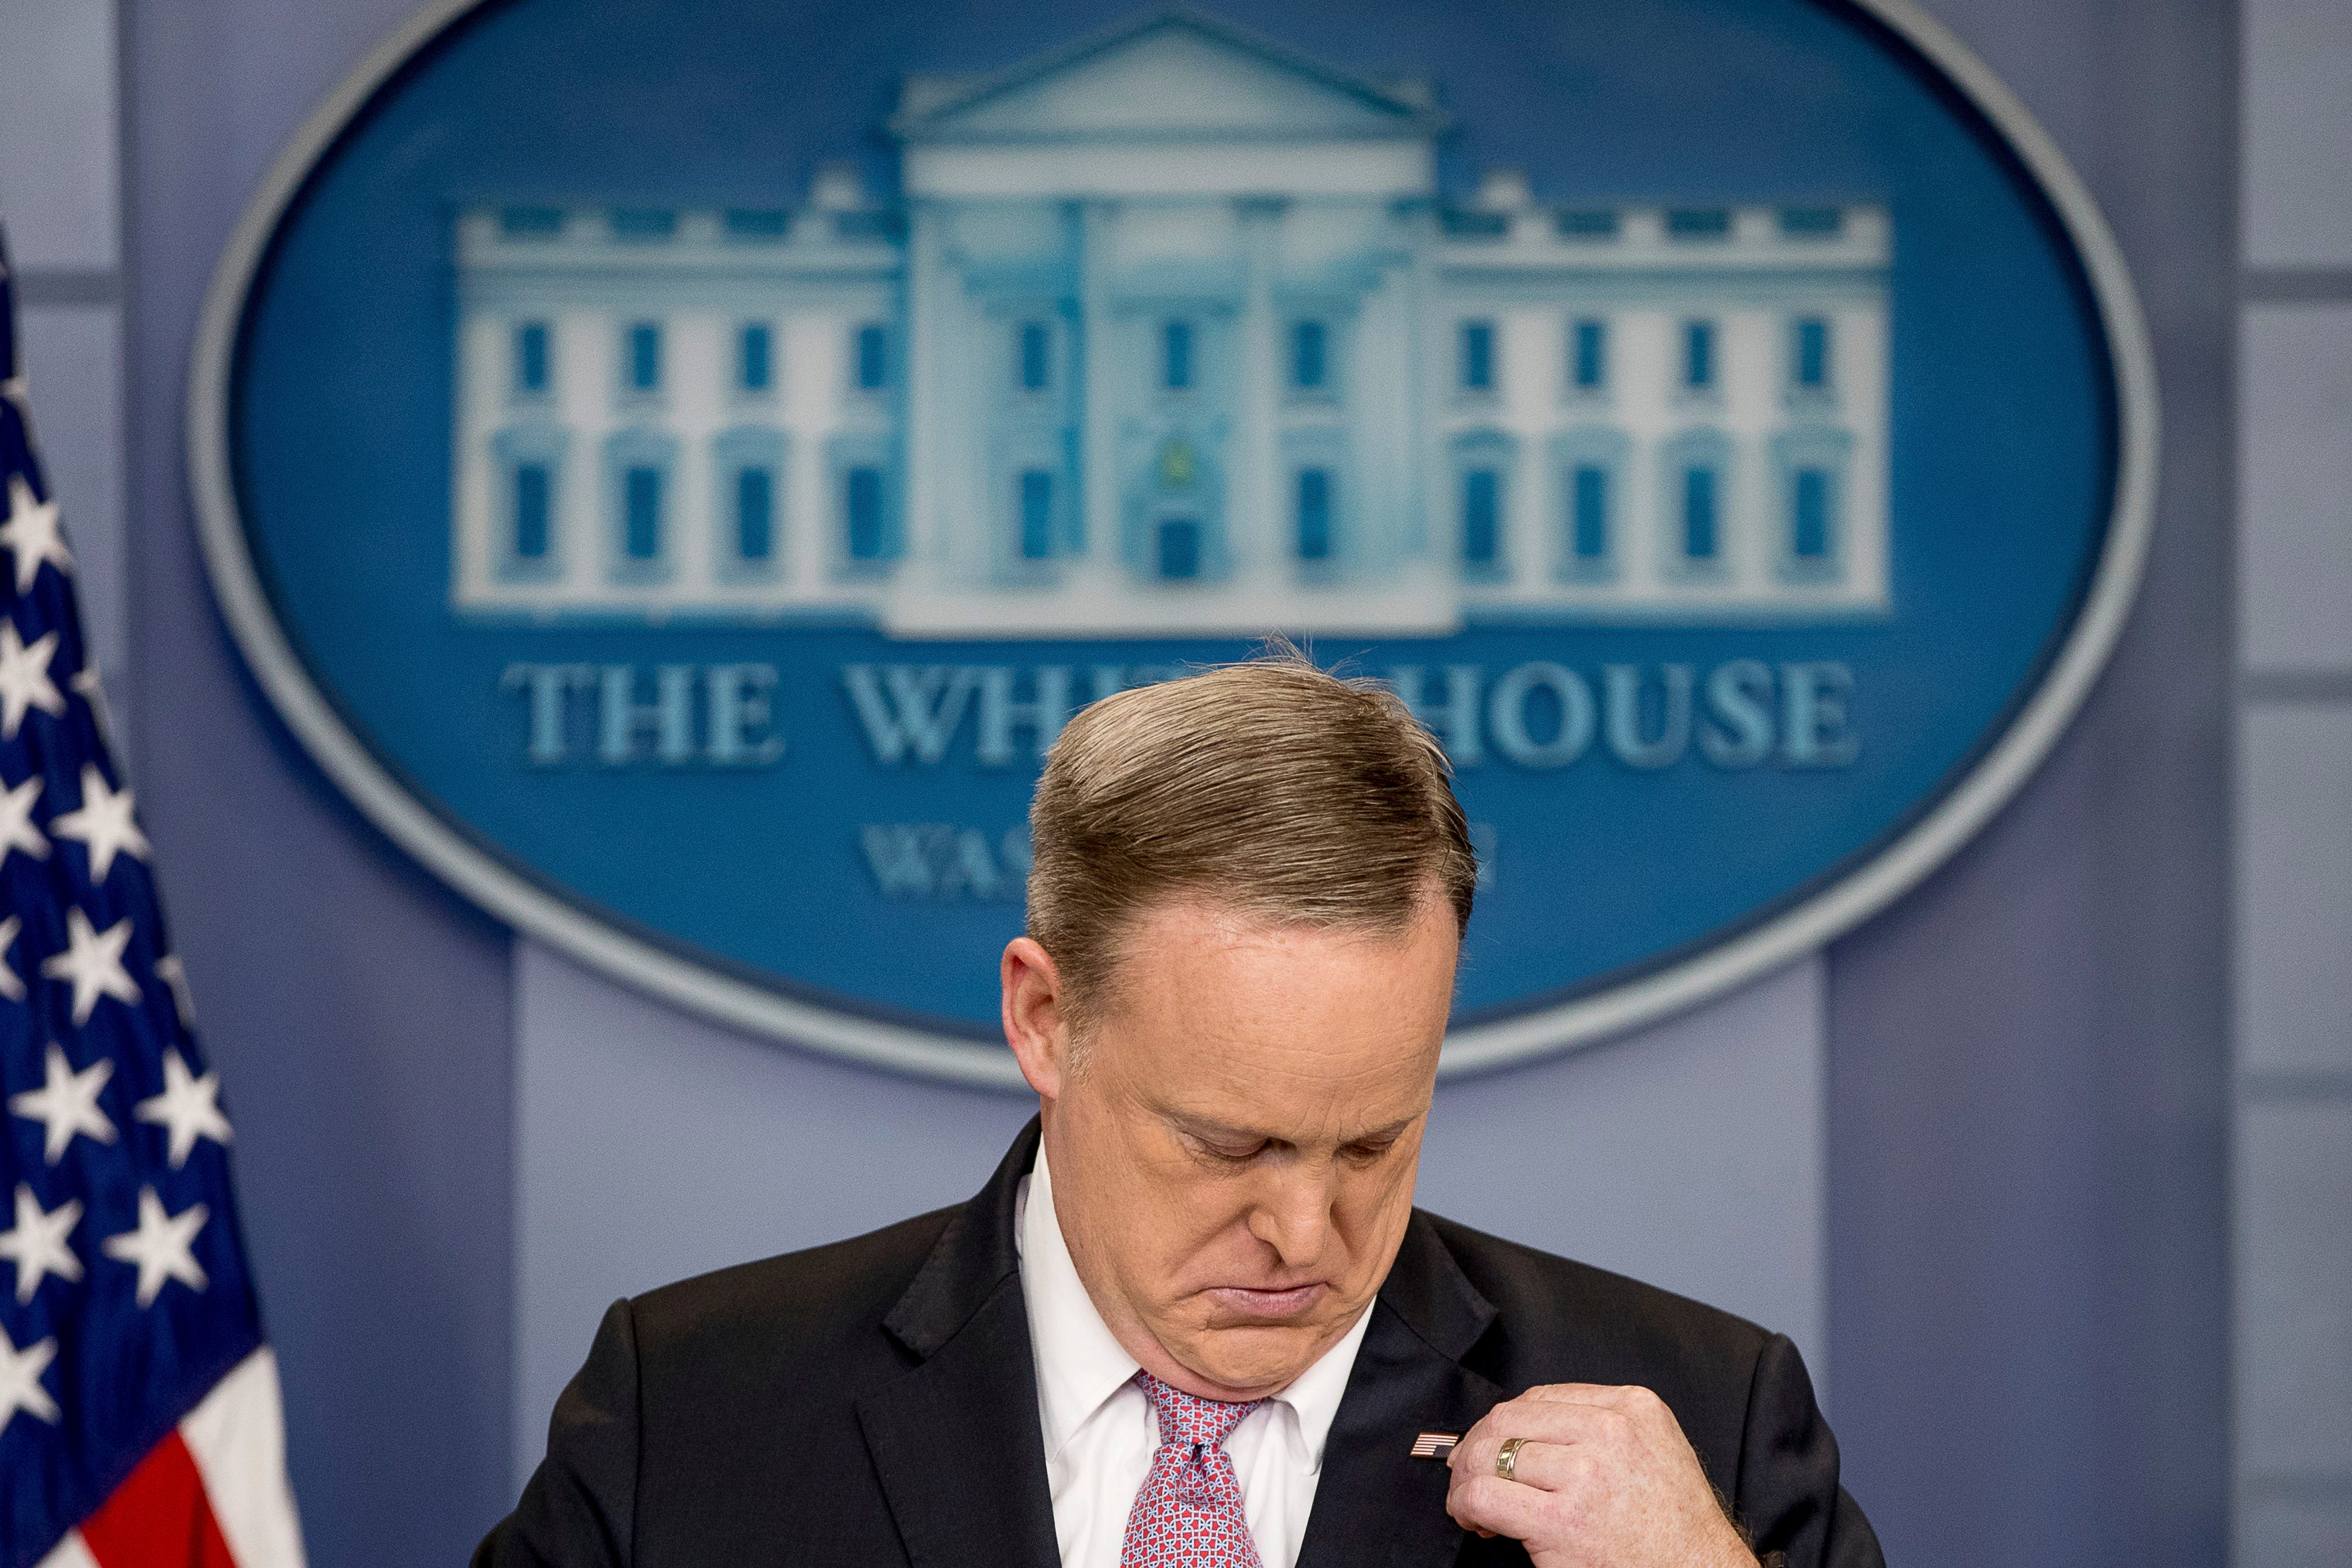 Fact check: ABC News execs, Obama did not ban American flag lapel pins